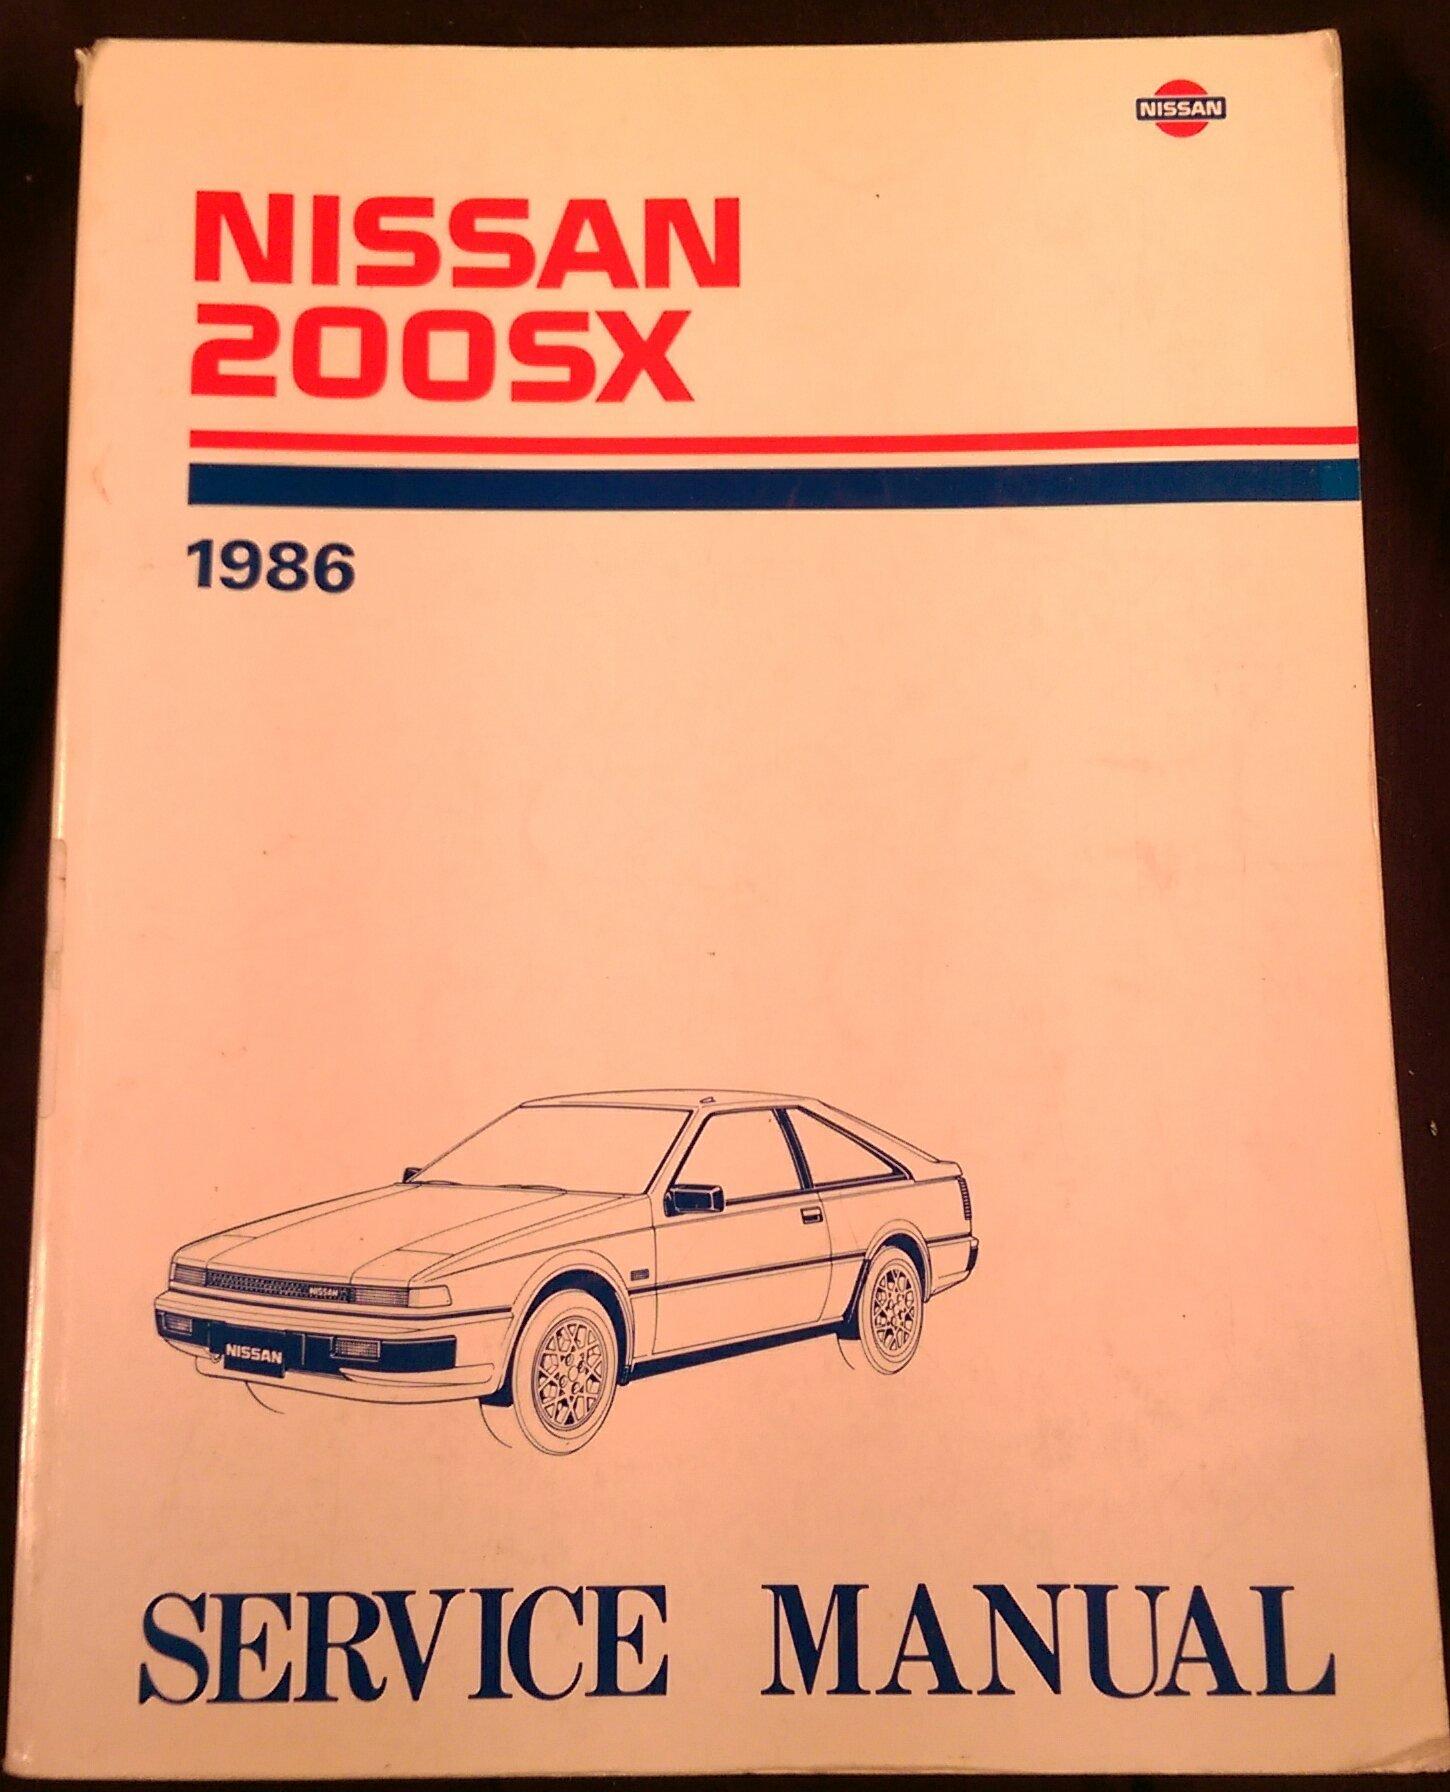 1986 Nissan 200SX Shop Service Repair Manual 200 SX: Nissan Motor  Corporation: Amazon.com: Books